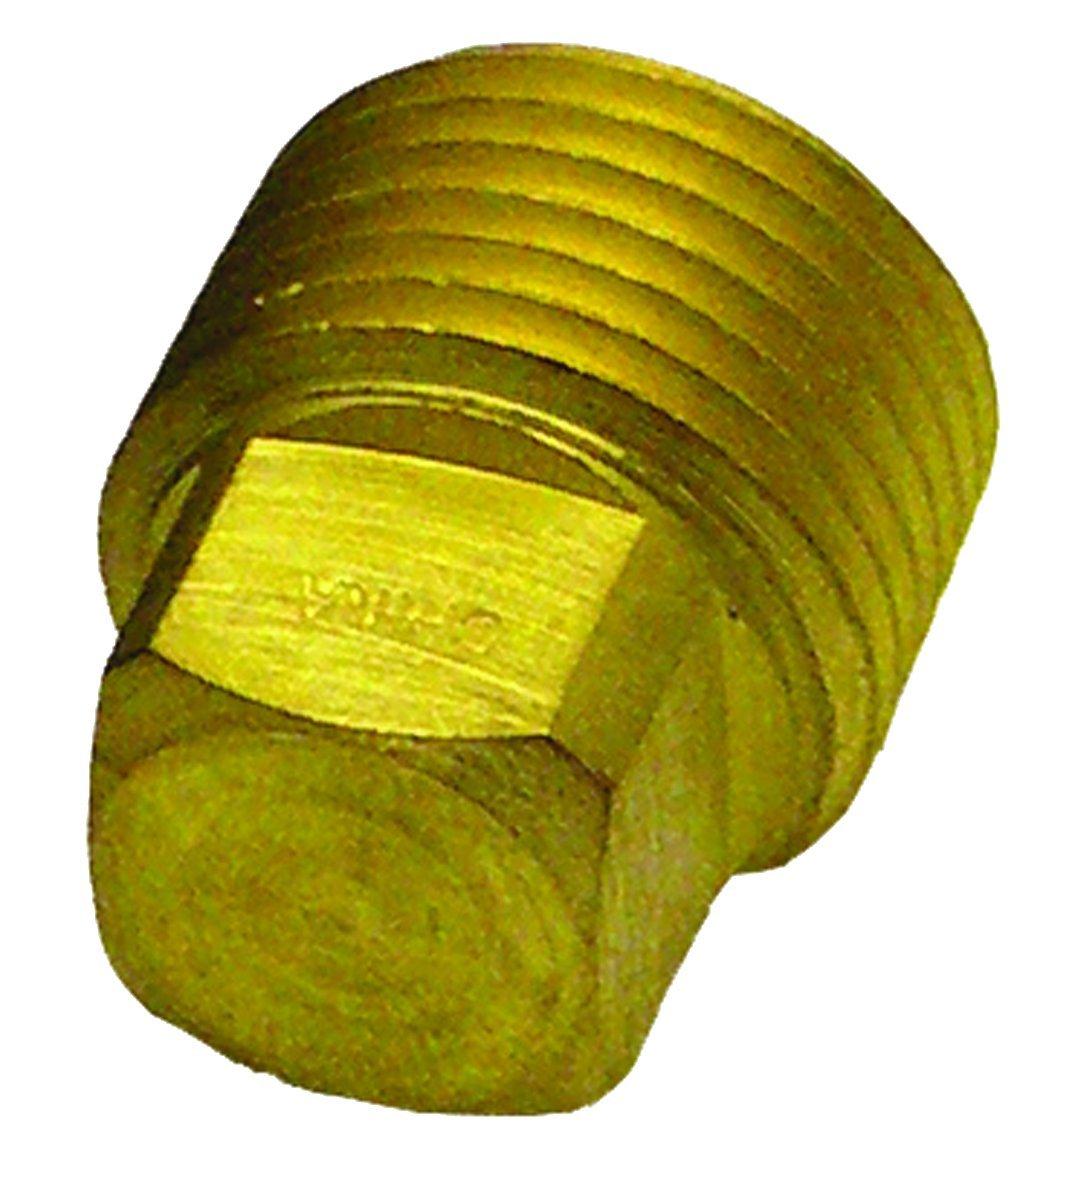 Invincible Marine 1-Inch Stainless Steel Twist Drain Plug